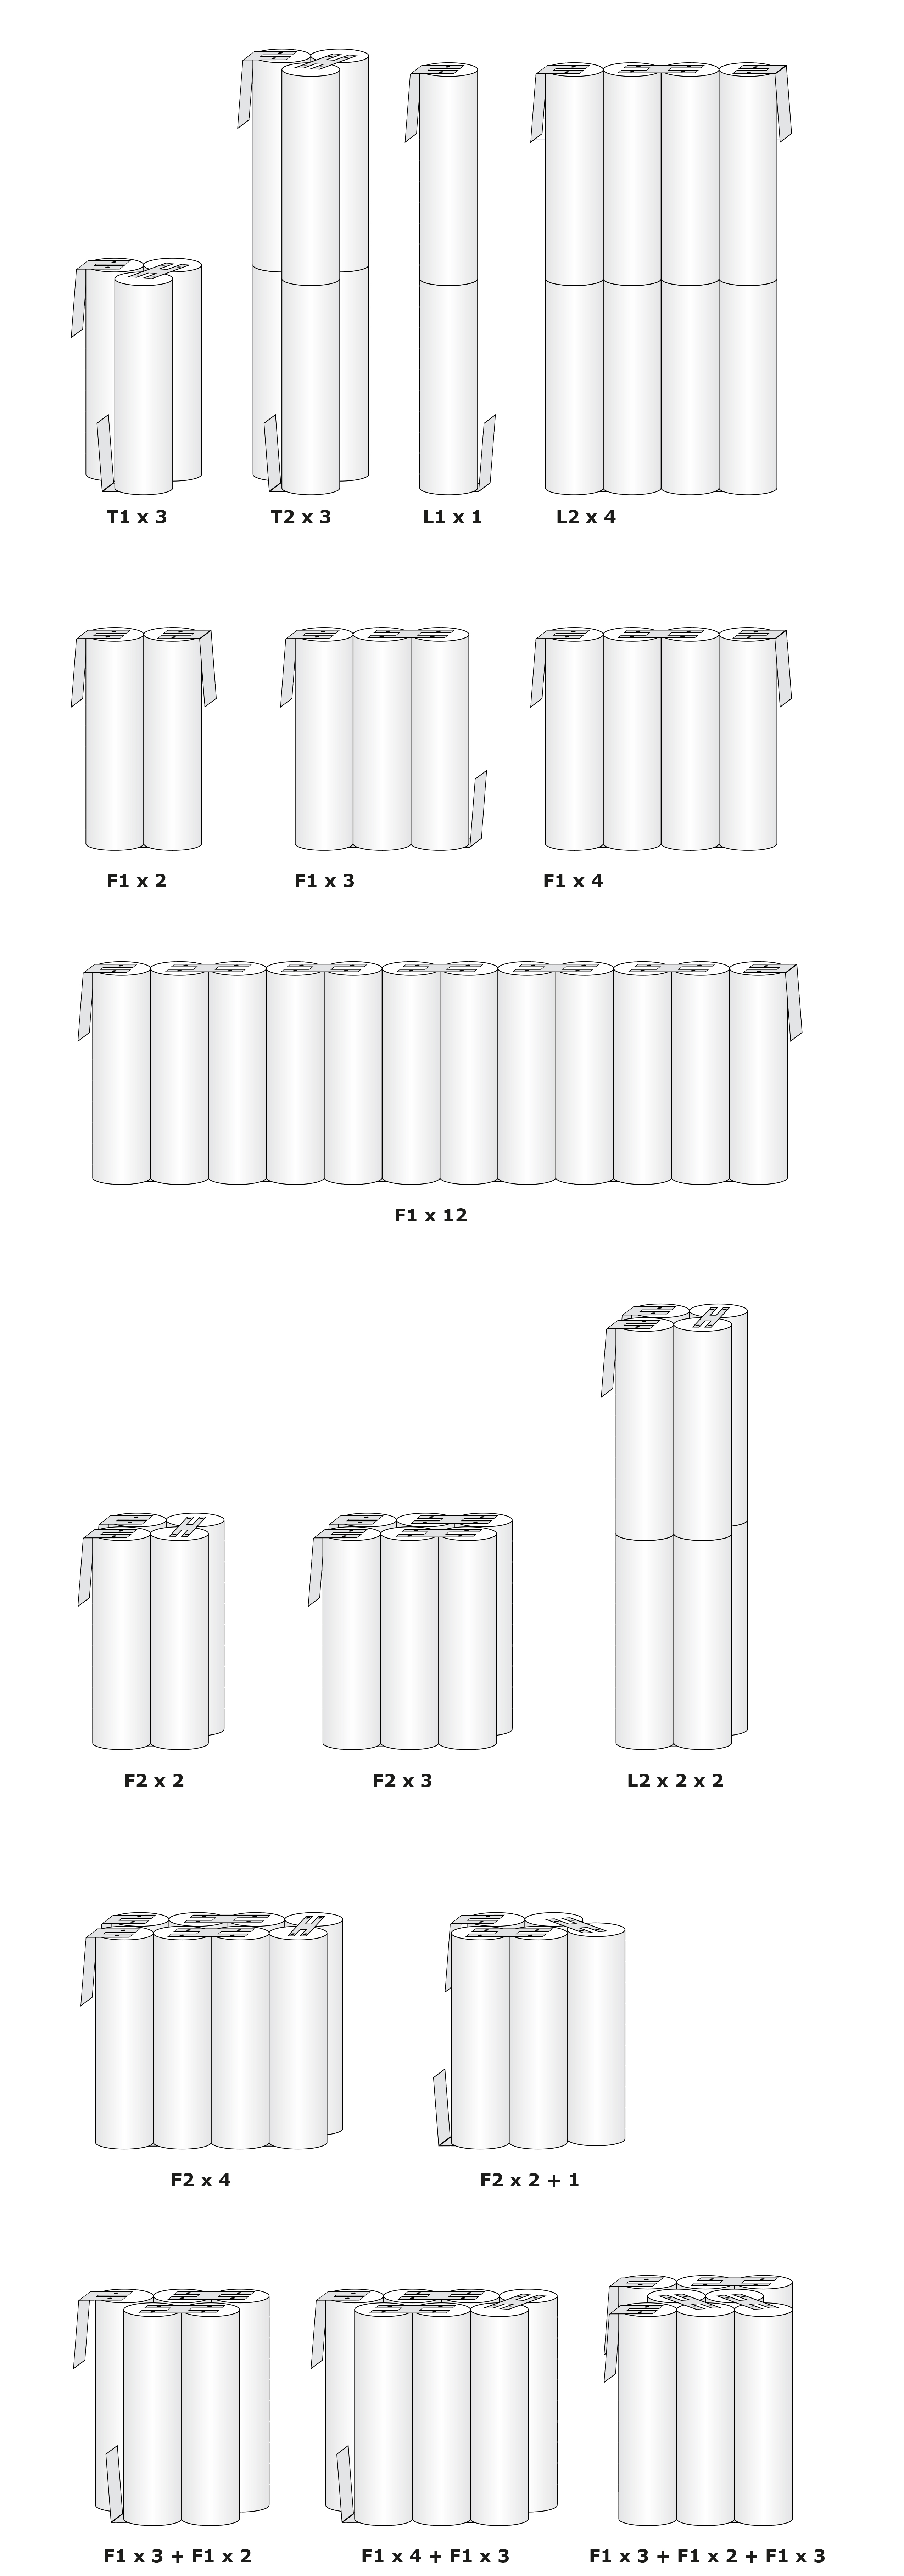 Batteripakkens opbygning